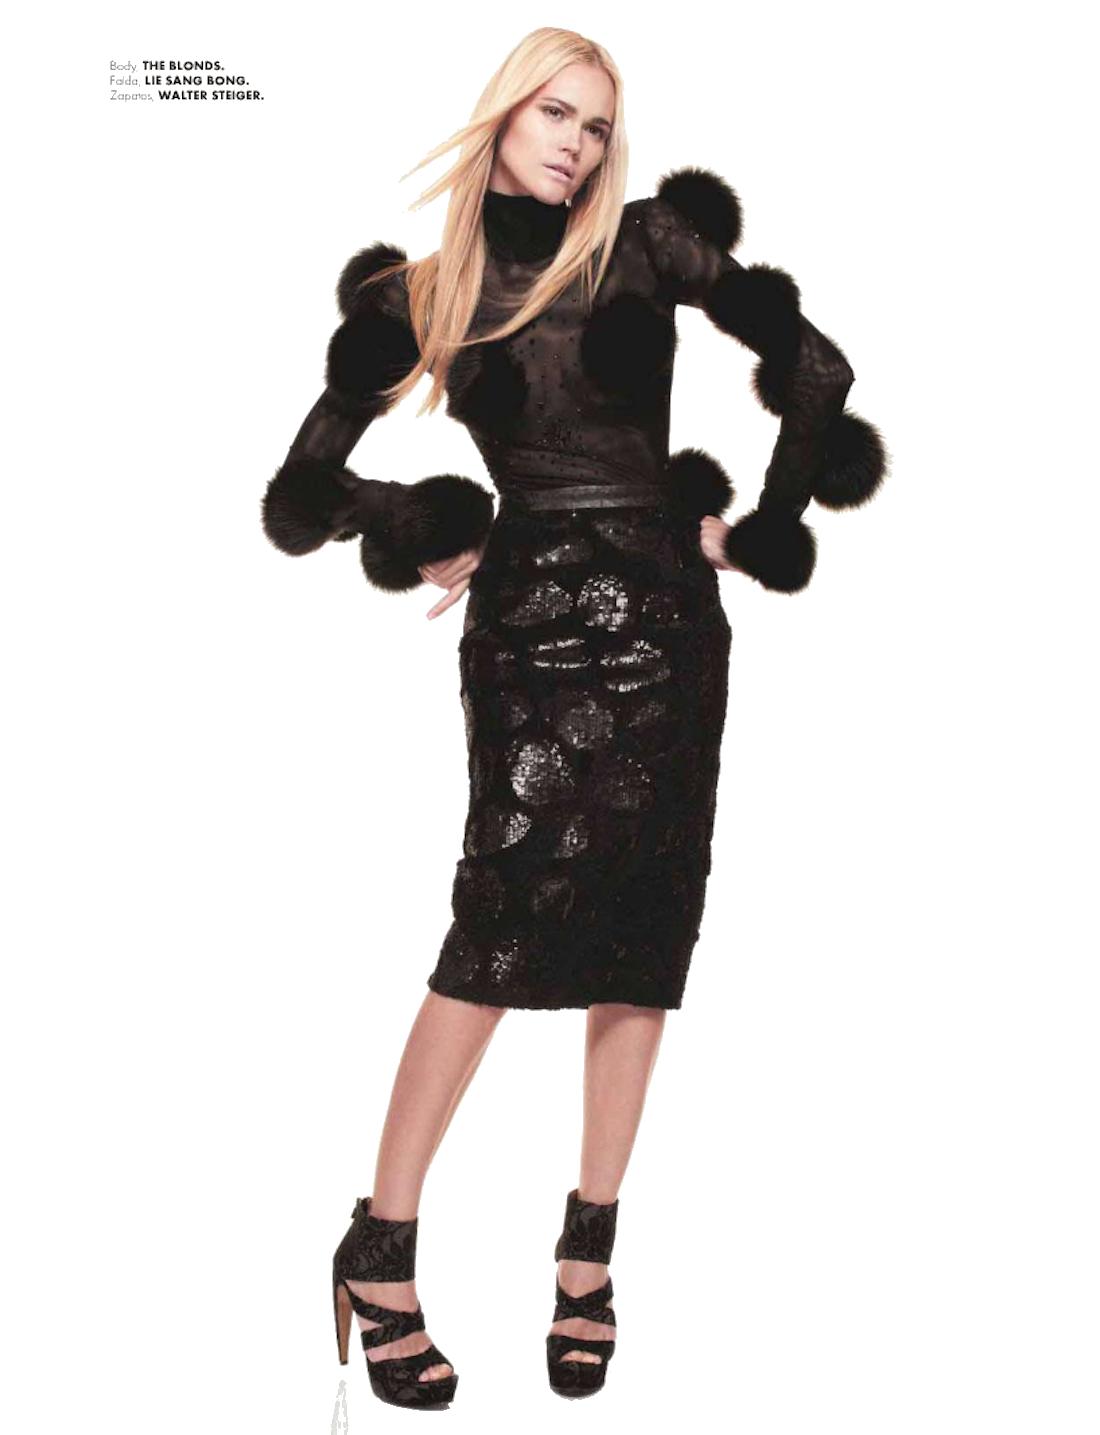 Download Fashion Model Free Download Hq Png Image Freepngimg